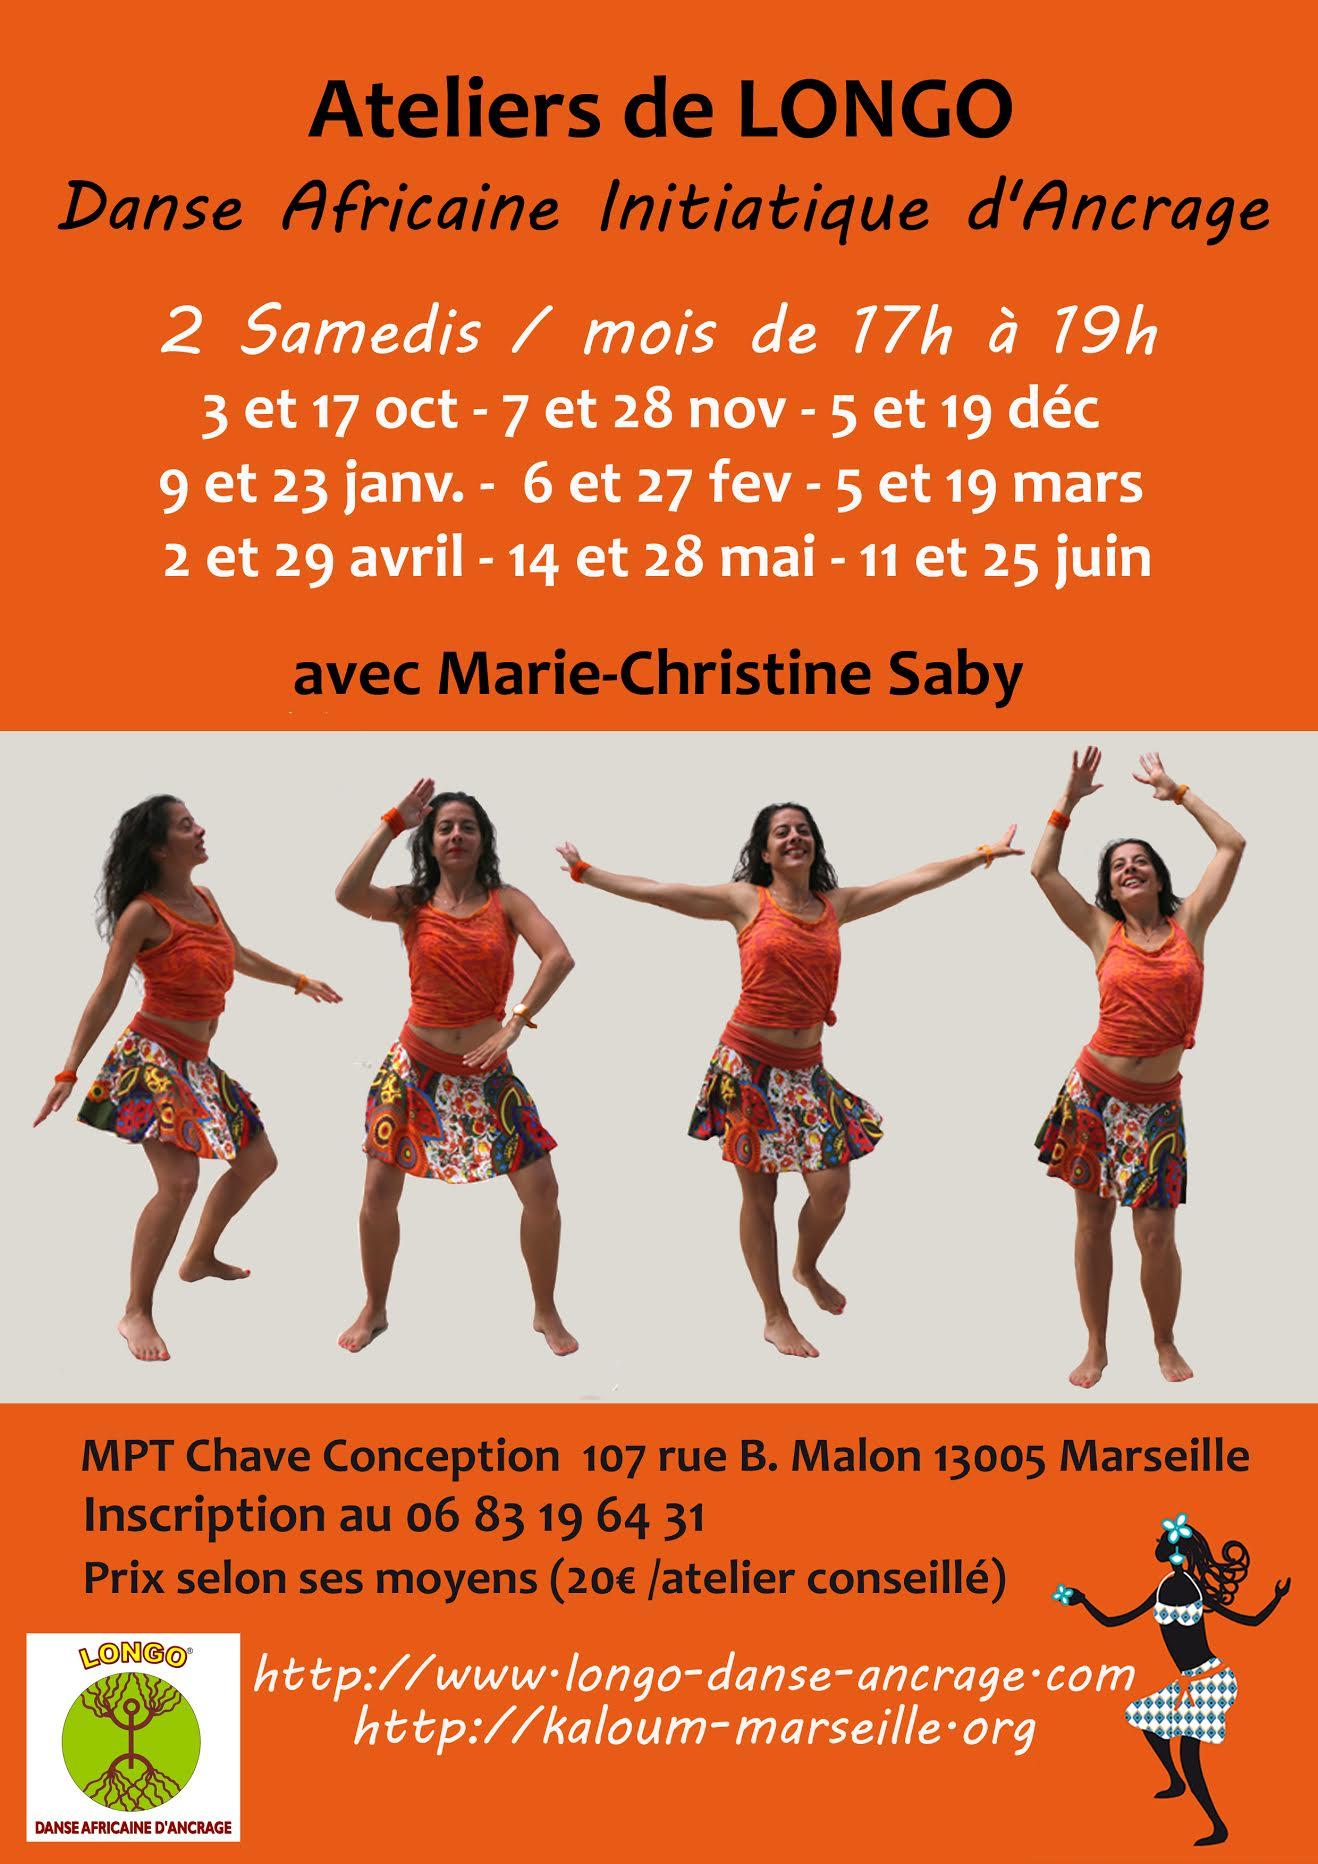 mc-saby-danse-africaine-d-ancrage